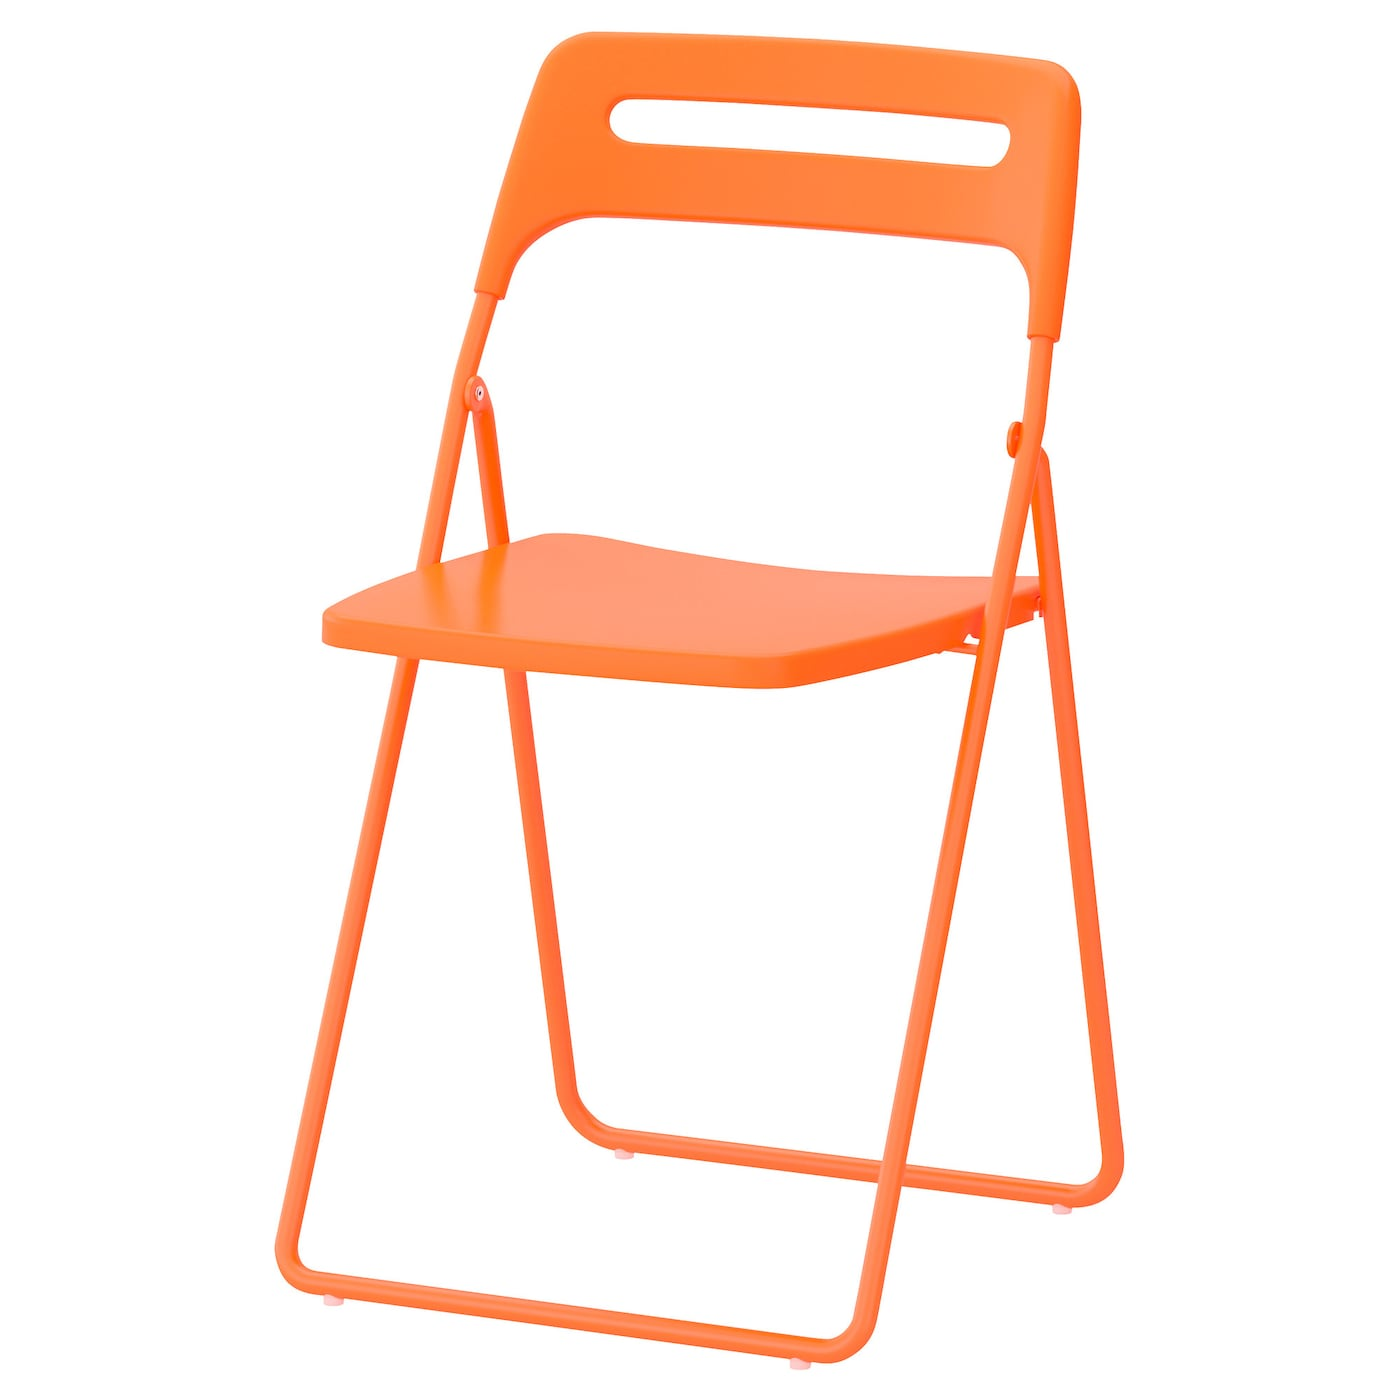 chaises salle manger ikea. Black Bedroom Furniture Sets. Home Design Ideas